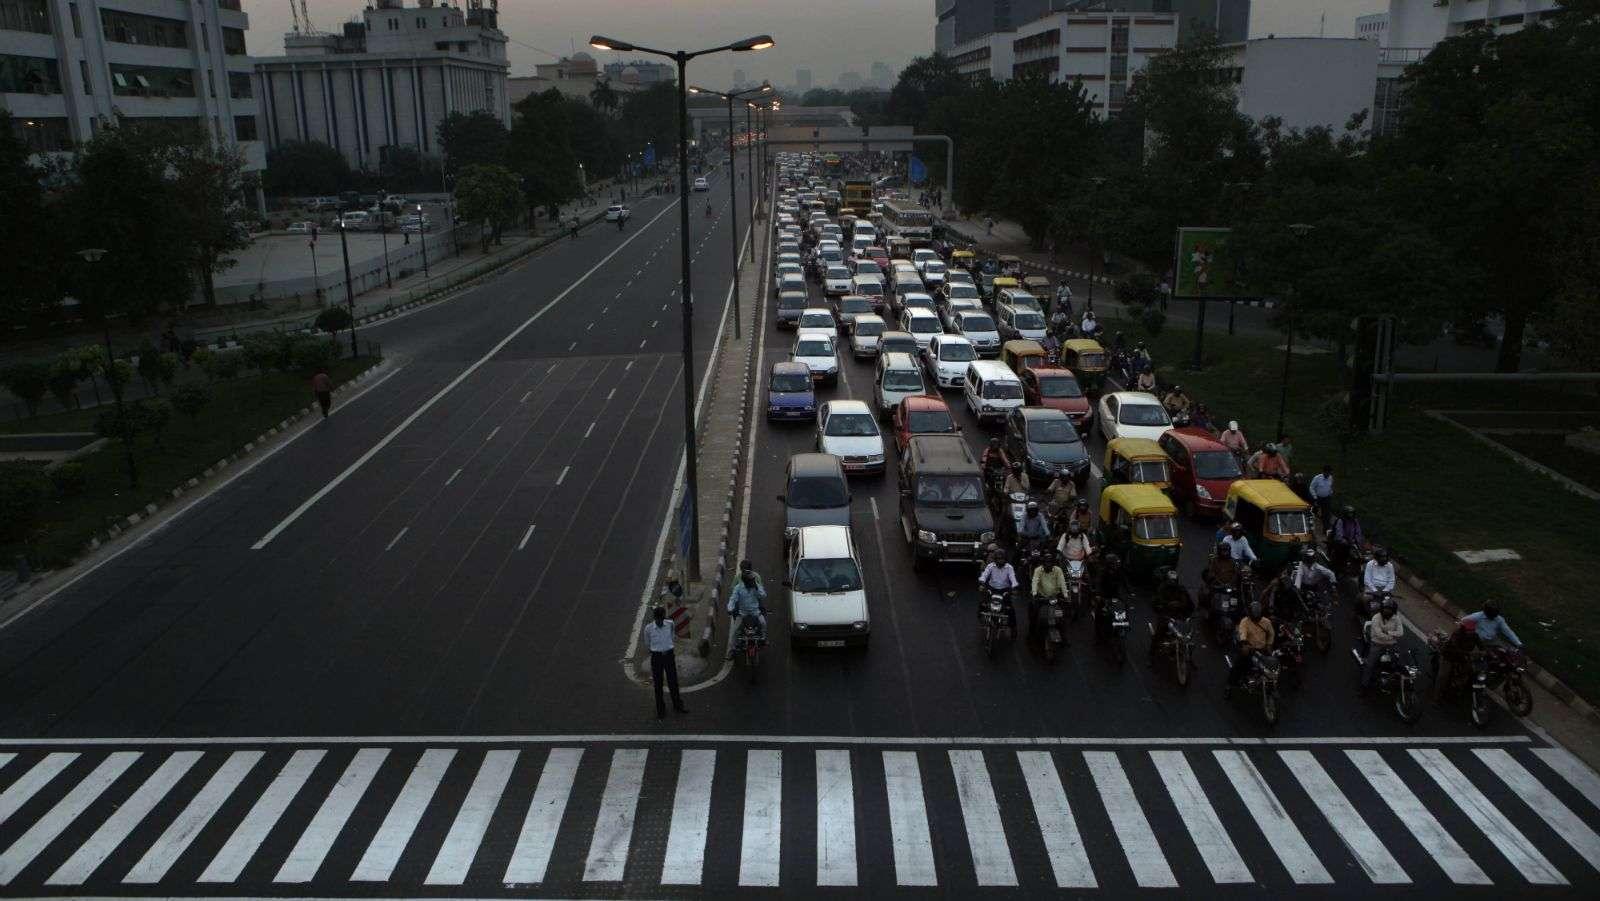 autonomous vehicles vs. human drivers